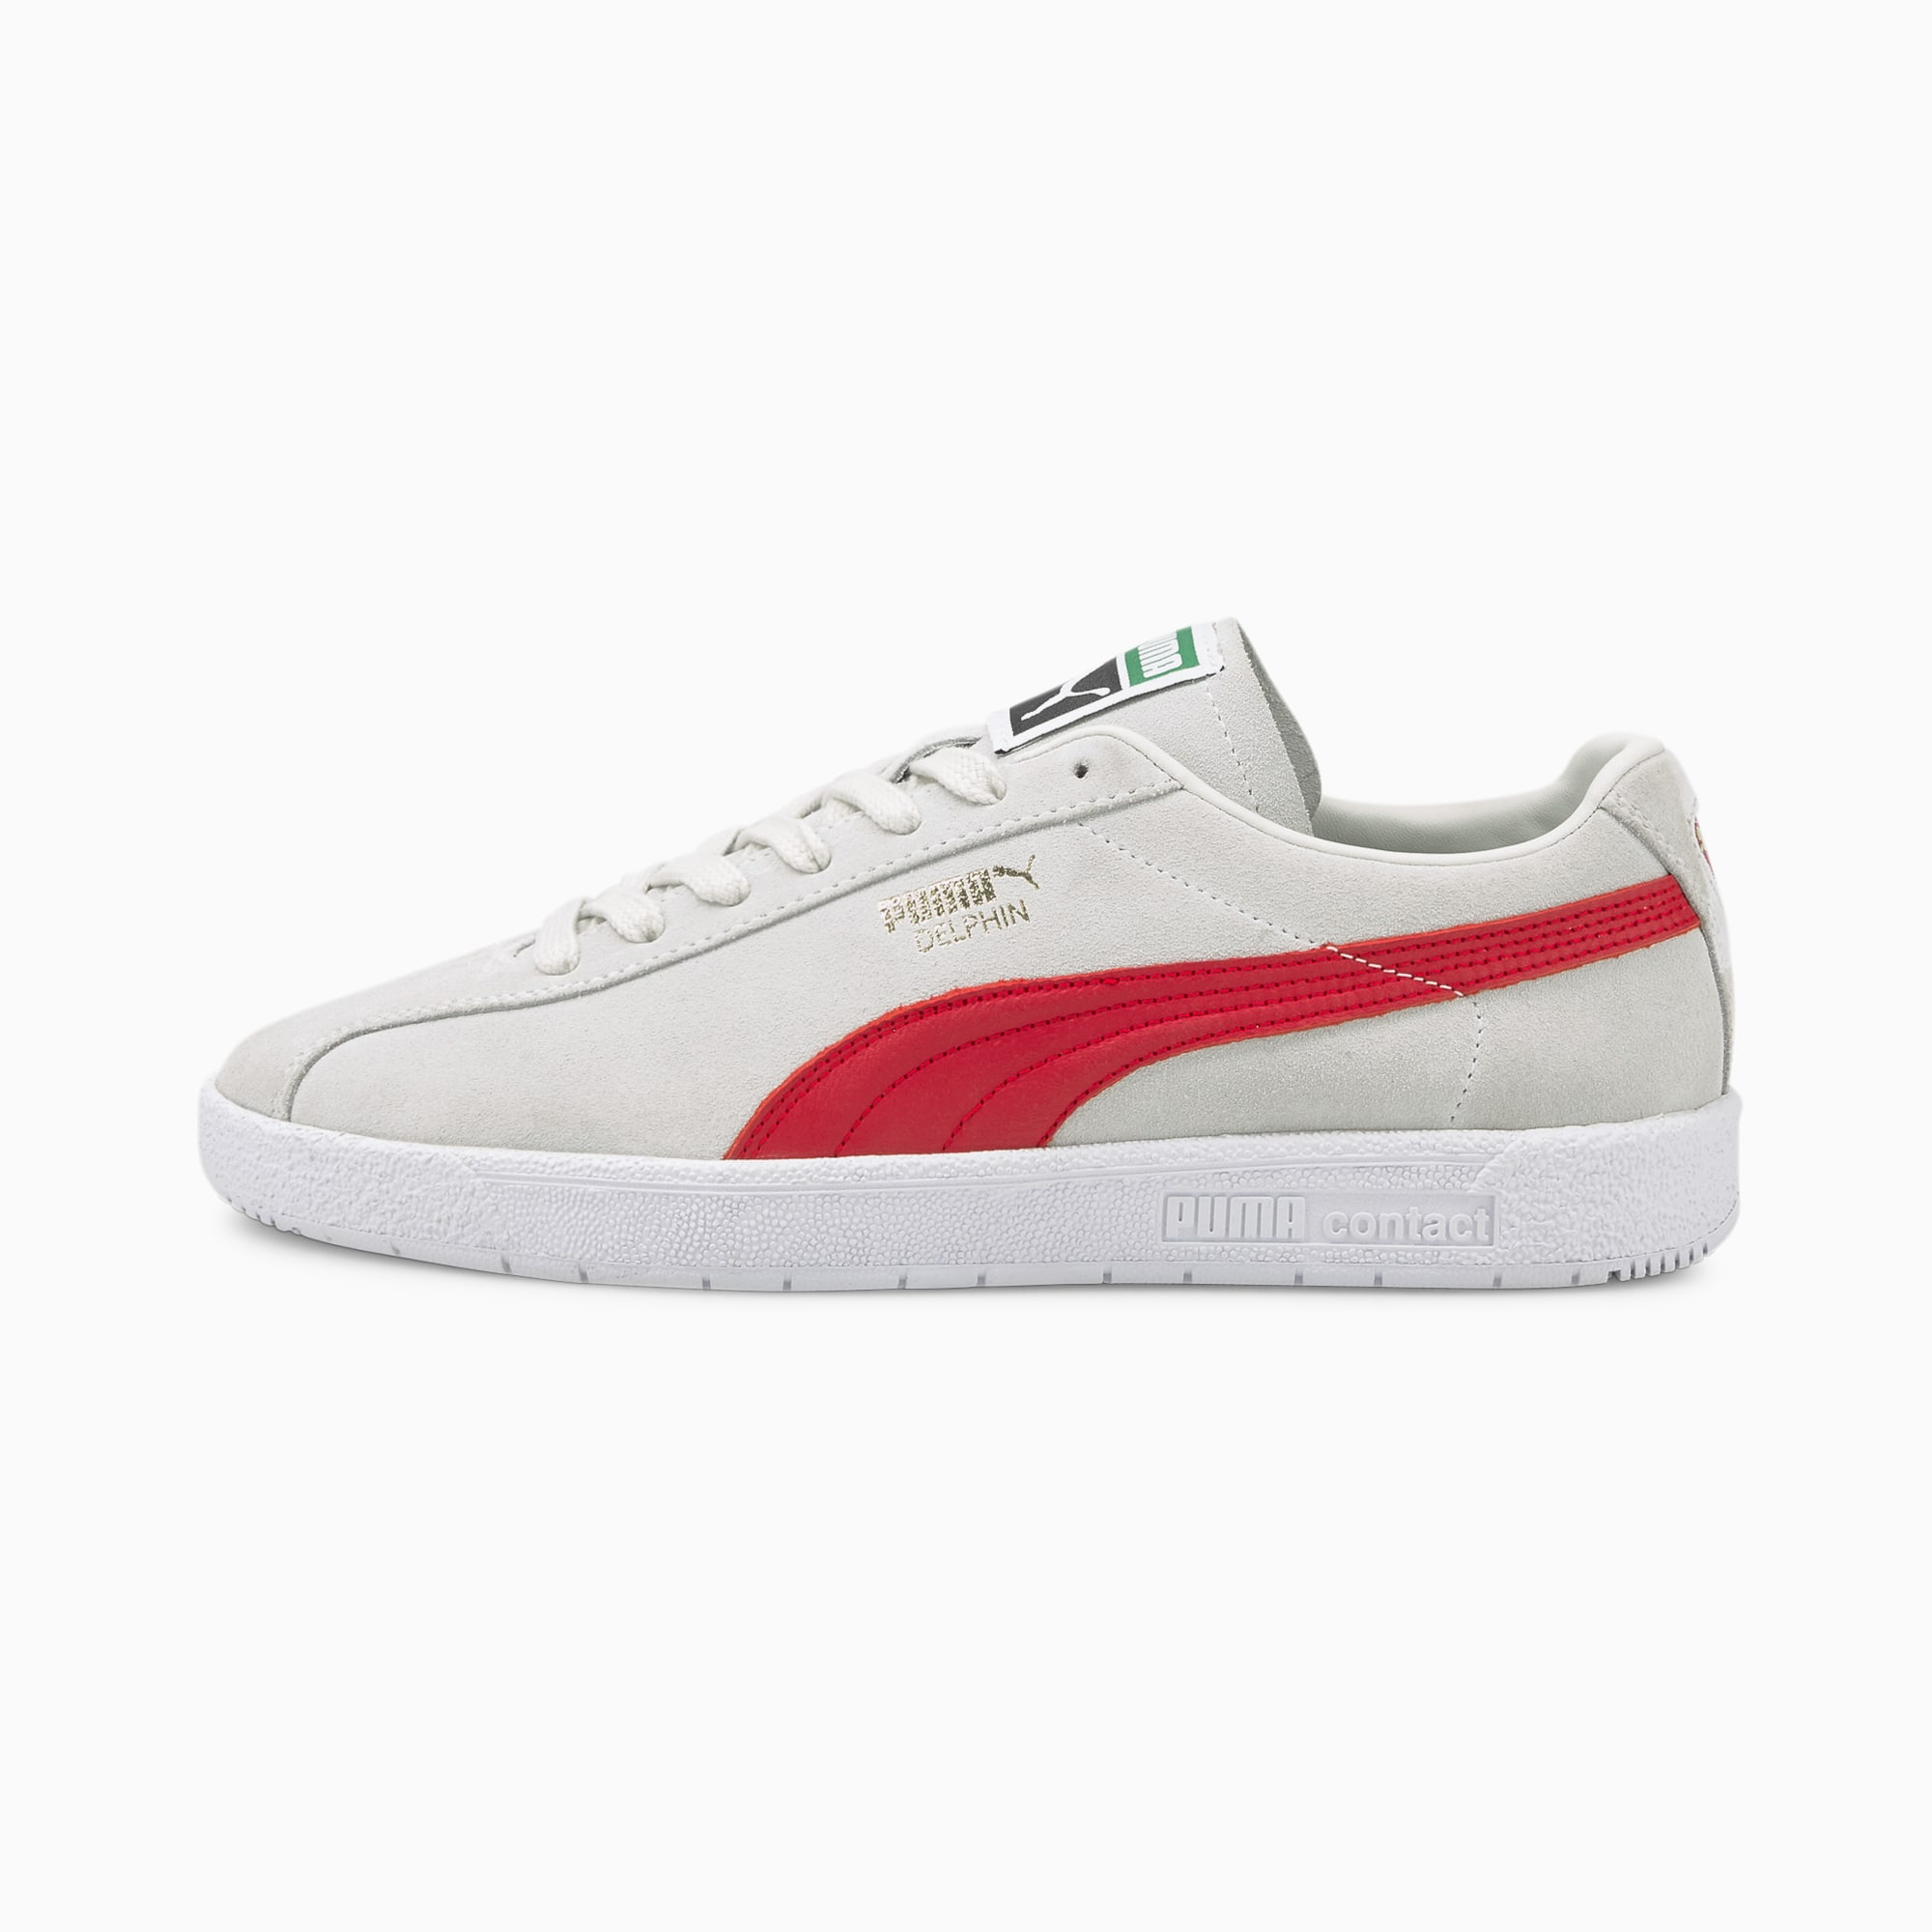 Chaussure Baskets Delphin, Blanc, Taille 43, Chaussures - PUMA - Modalova